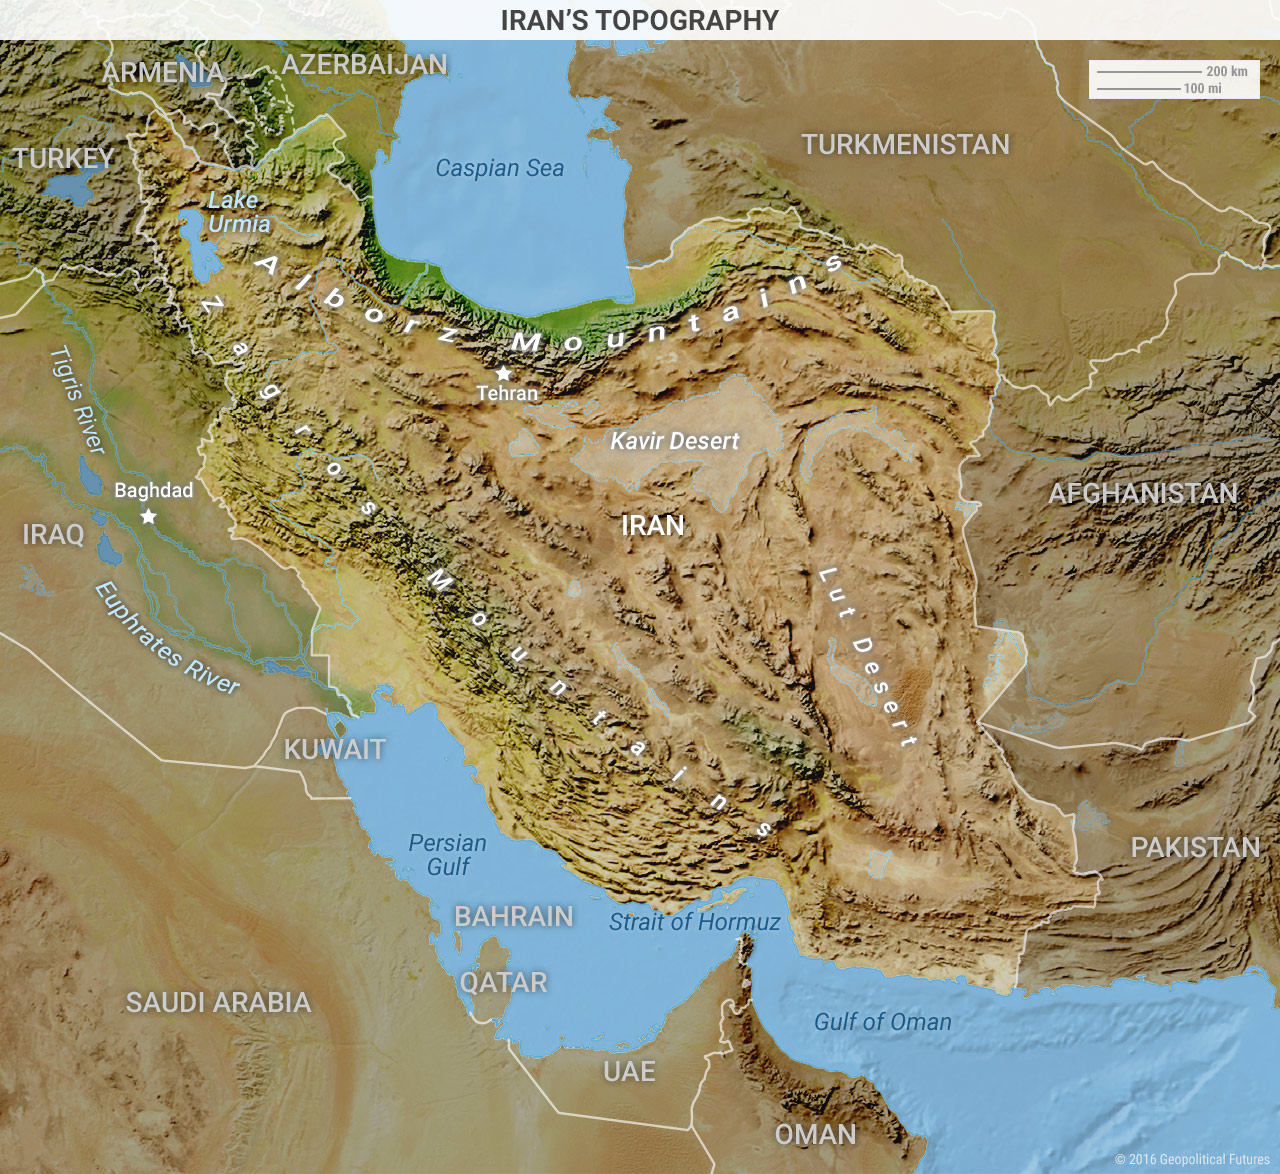 iran-topography